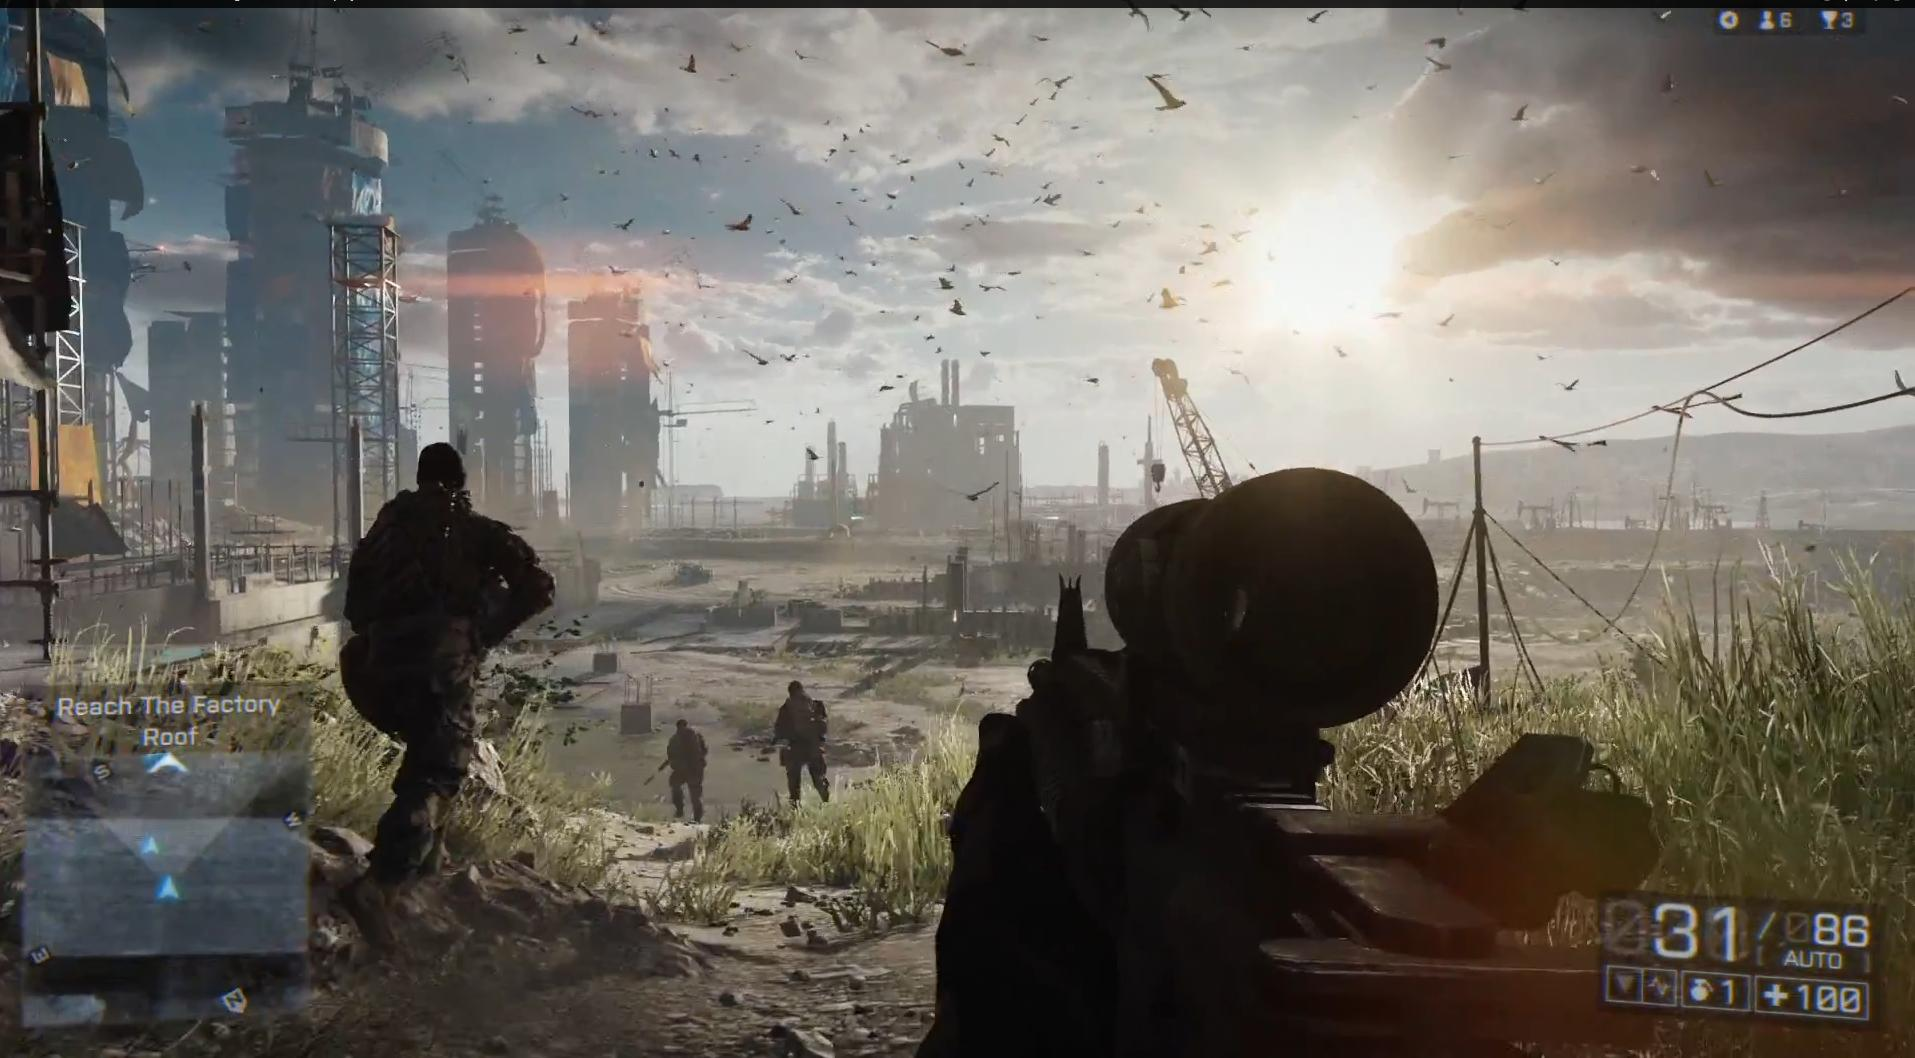 Battlefield 4 Full Graphics Settings